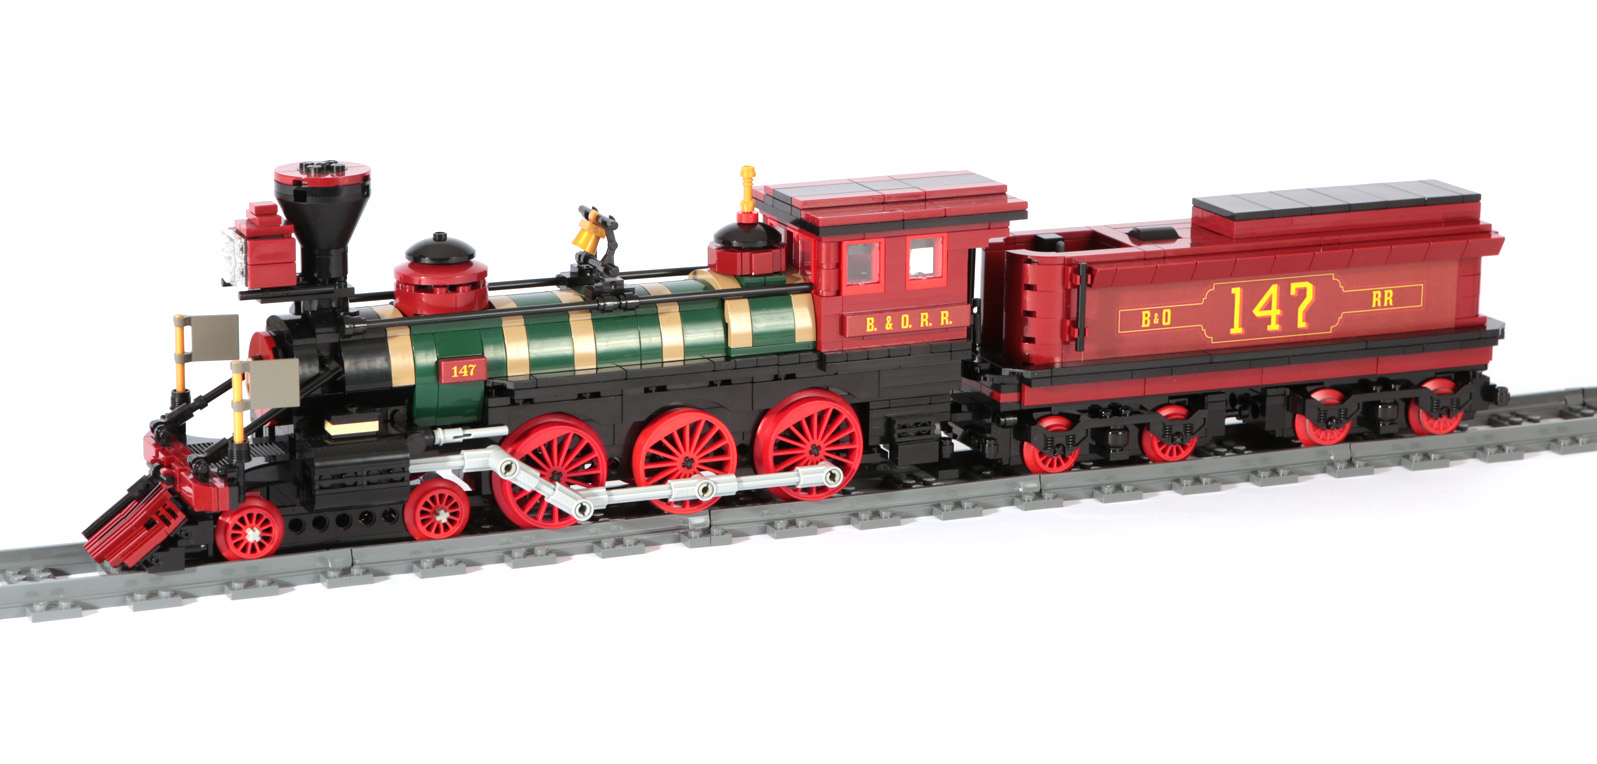 US-Dampflok (Western Lok) Thatcher Perkins (eigene Modelle MOC)